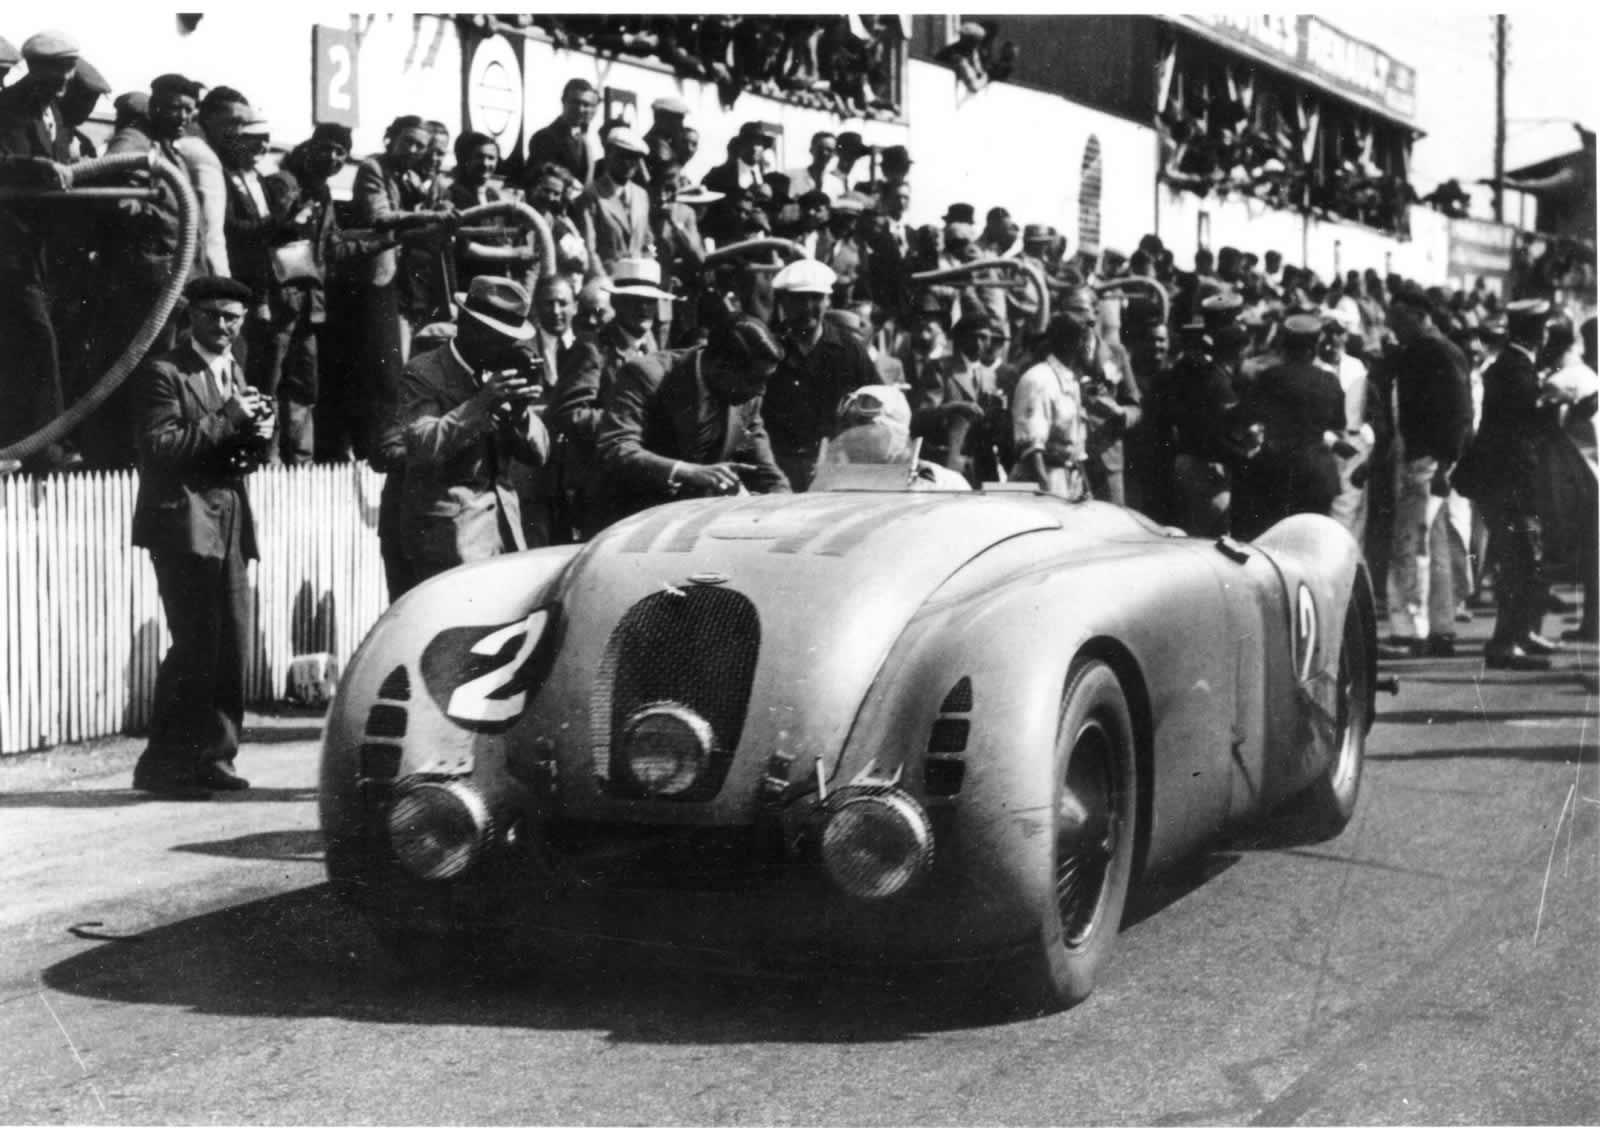 bugatti veyron grand sport vitesse legend jean pierre wimille edition force. Black Bedroom Furniture Sets. Home Design Ideas